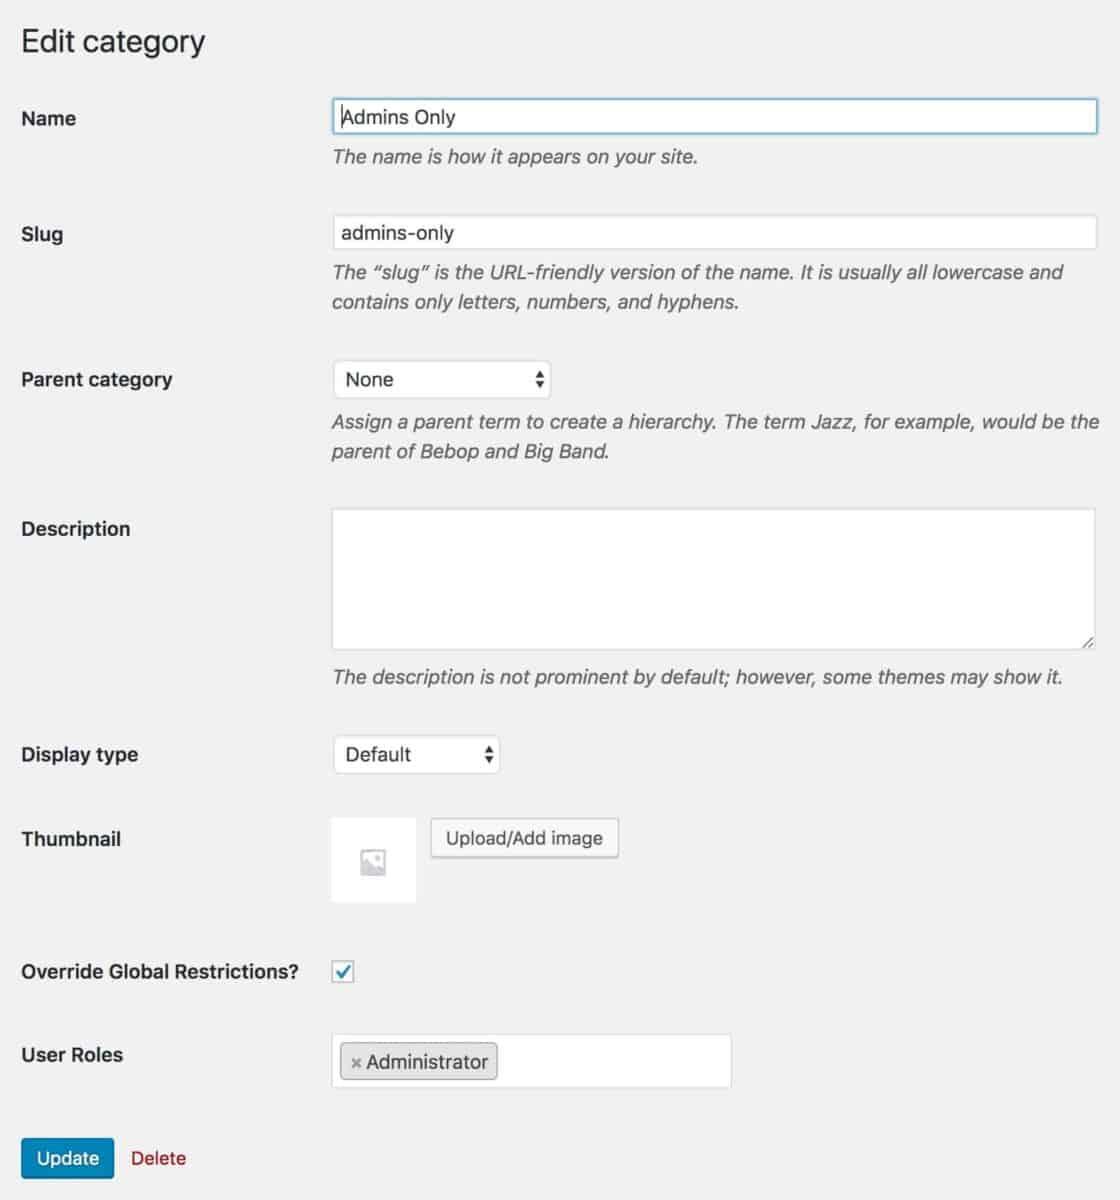 WooCommerce edit categories screen